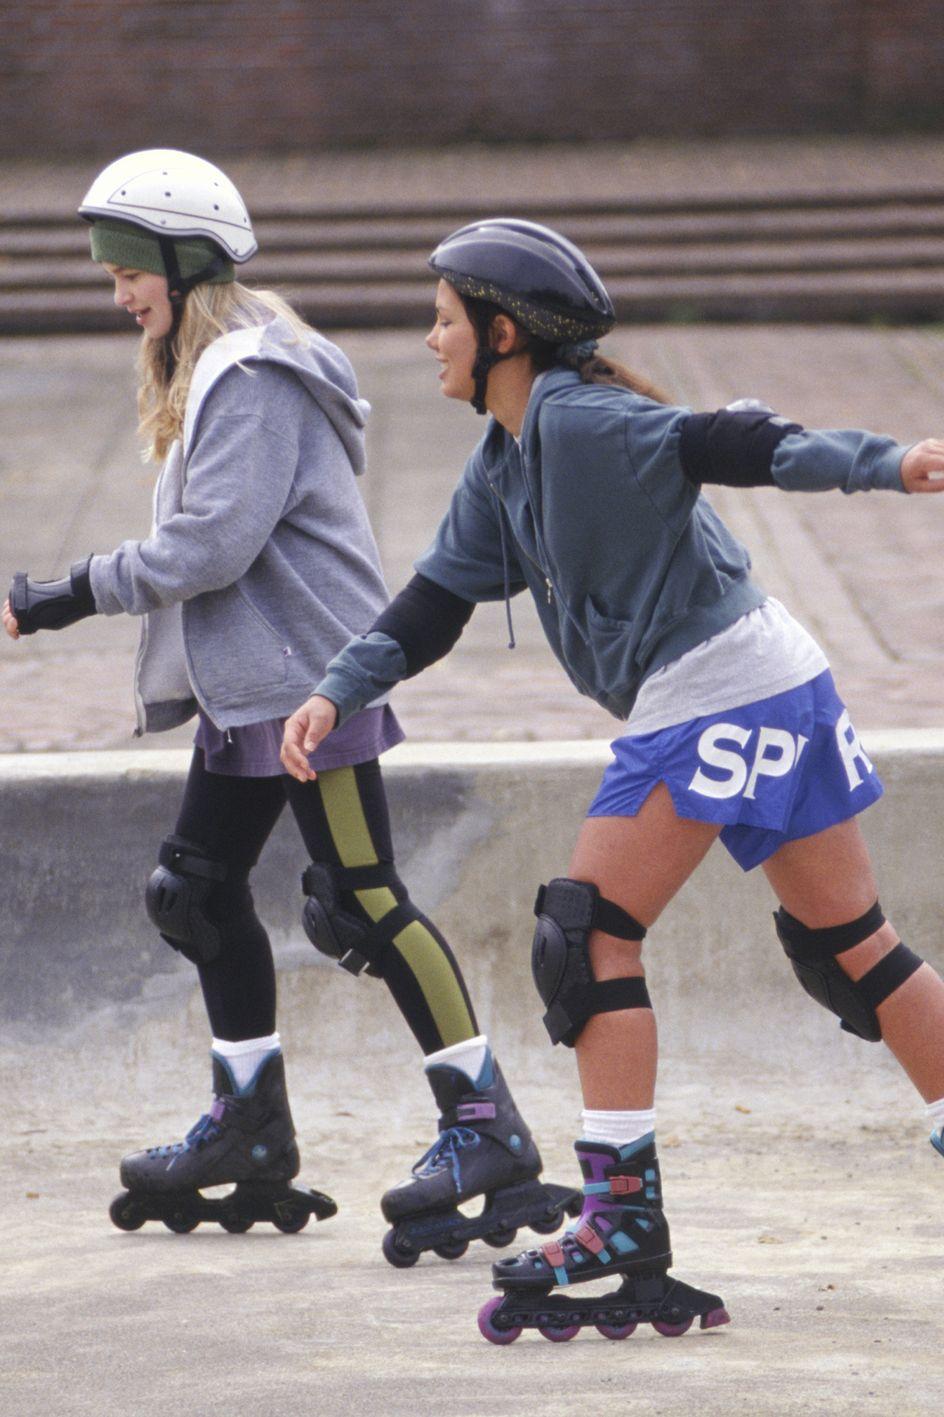 Two teenage girls (14-15) inline skating in park